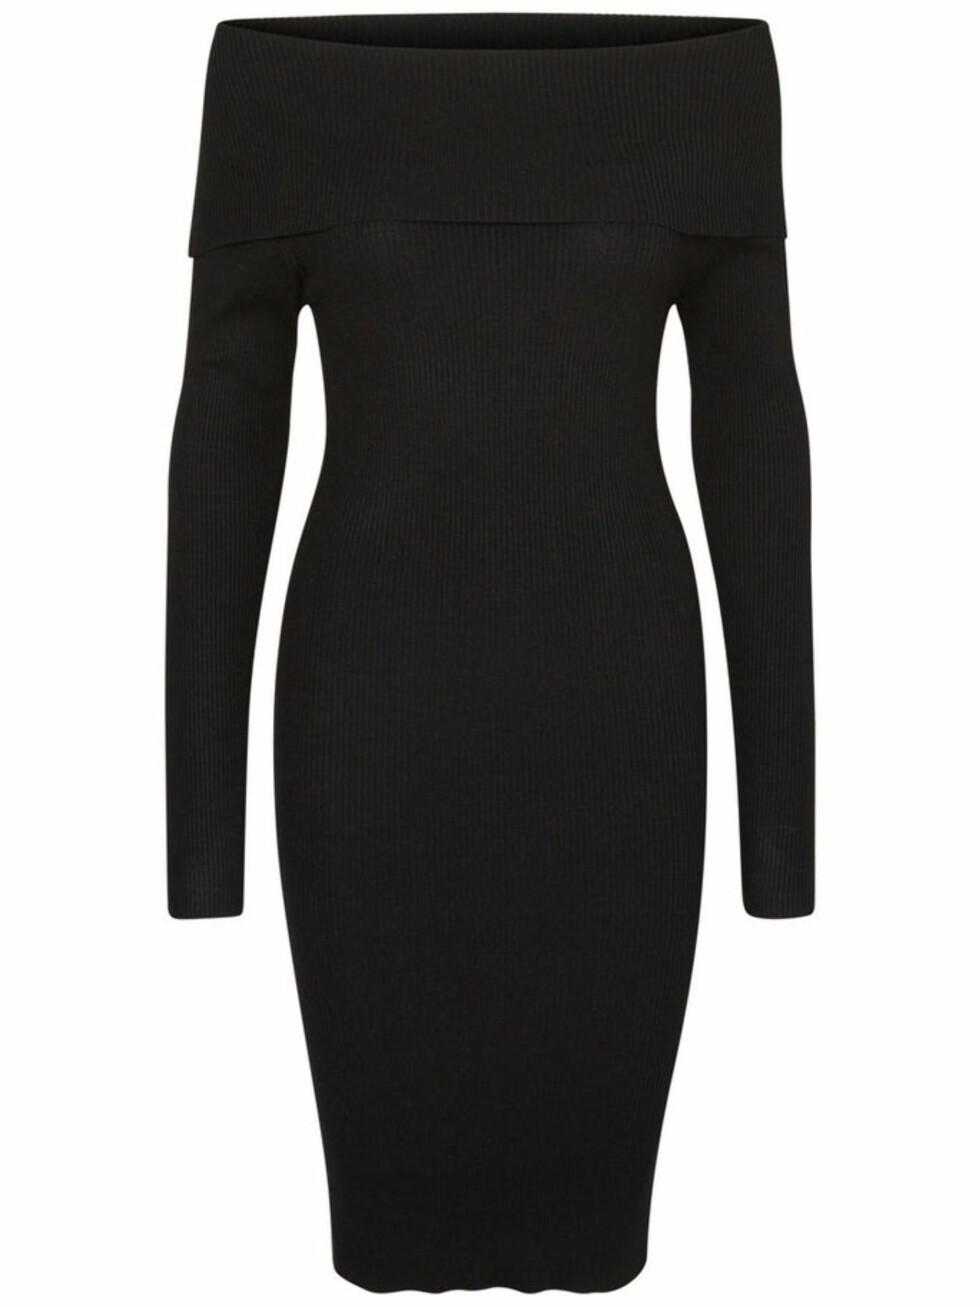 <strong>Kjole fra Vero Moda   kr 449,95   http:</strong>//www.veromoda.com/no/no/vm/handla-efter-kategori/kjoler/off-shoulder-kjole-10158223.html?cgid=vm-dresses&dwvar_colorPattern=10158223_Black